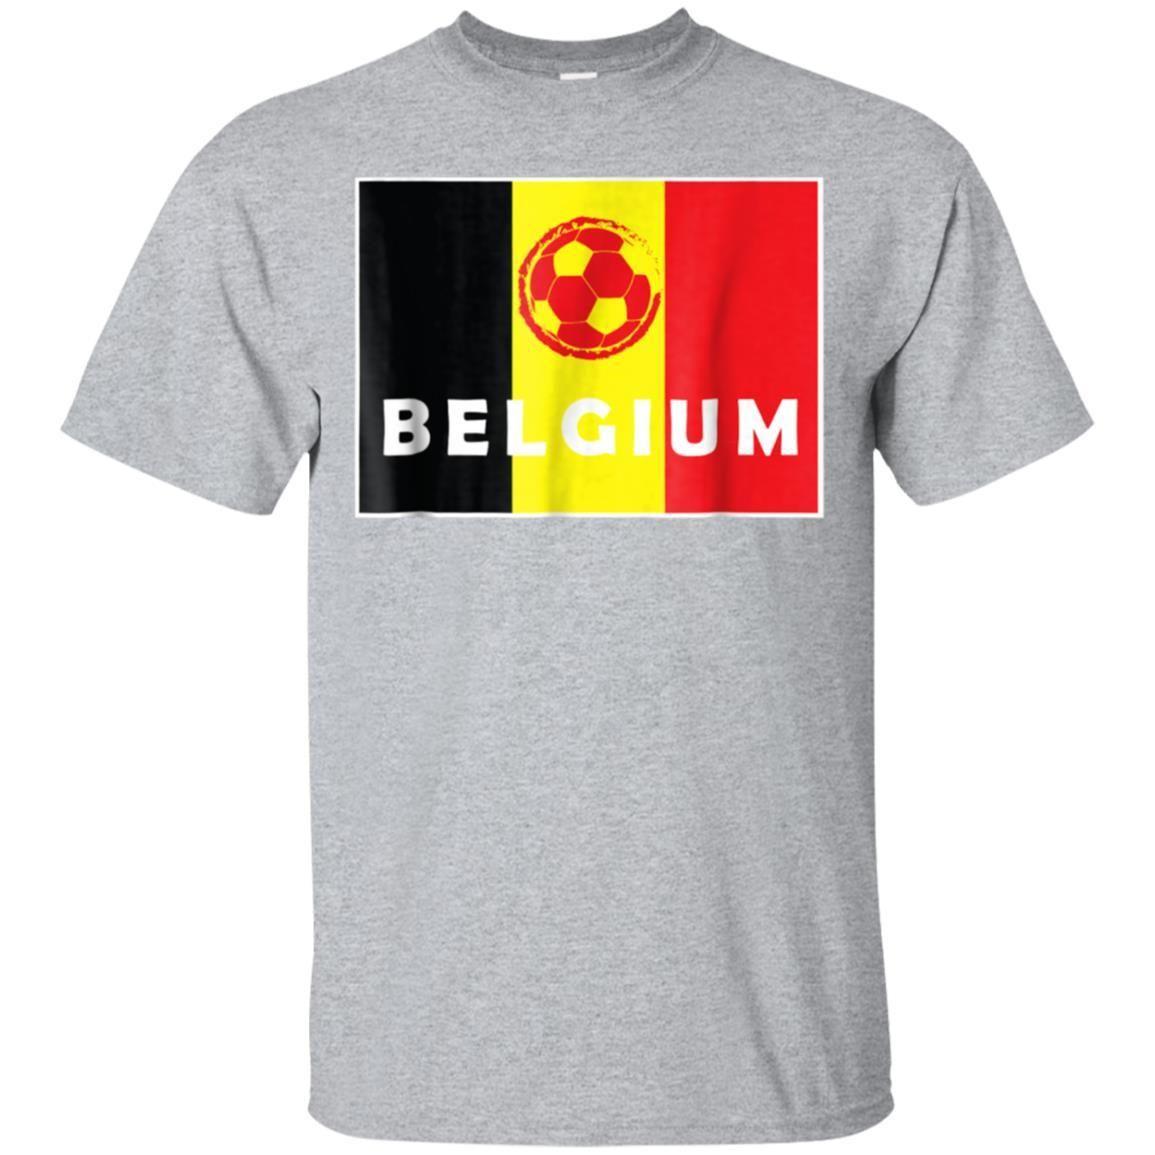 99promocode Belgium T-shirt Belgian Soccer Football Jersey Team Fan 2018 94a6131ee